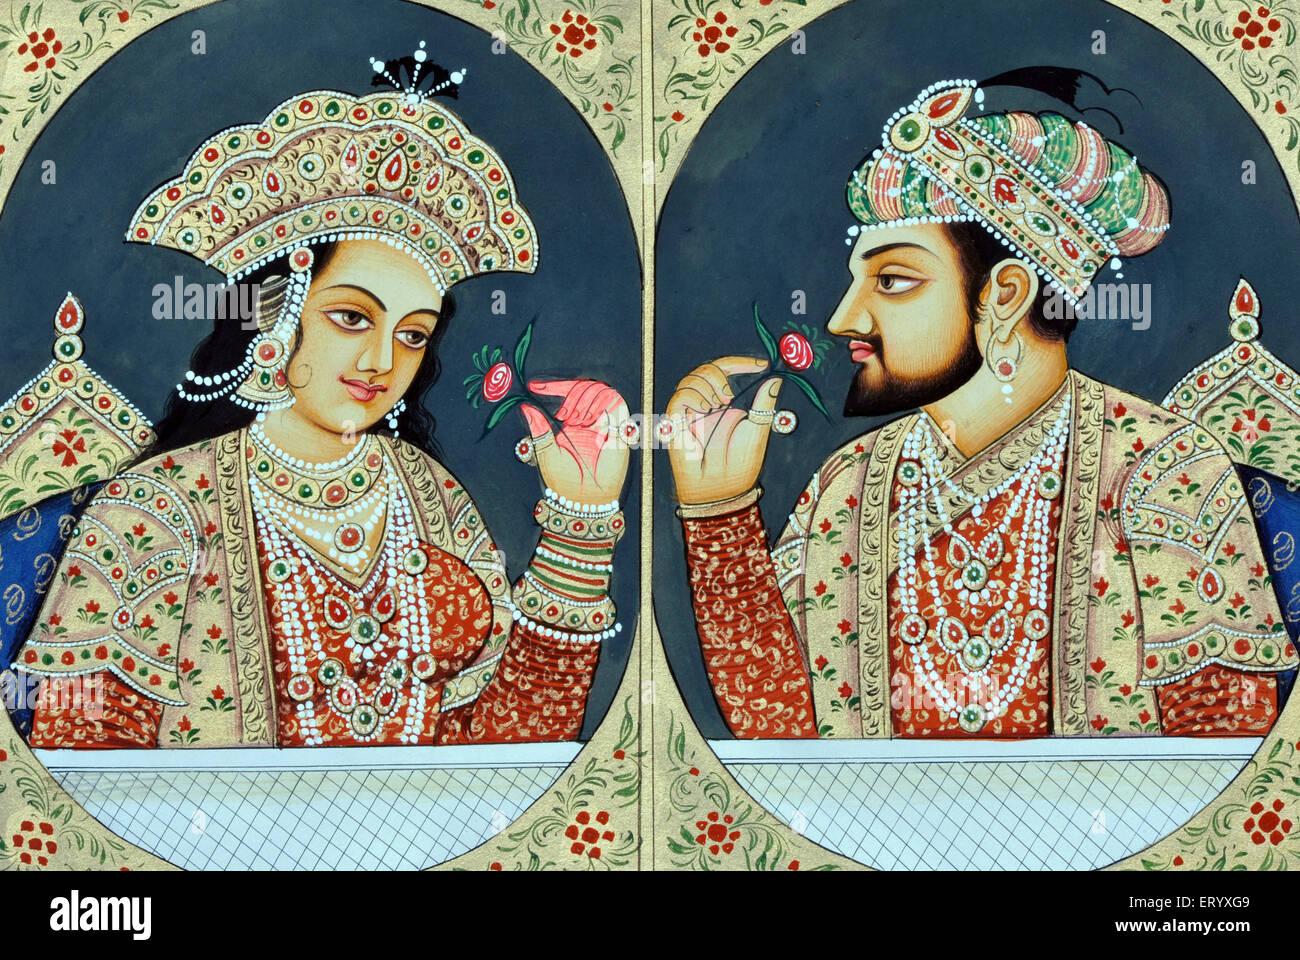 Shah Jahan and Mumtaz Mahal Miniature Painting Stock Photo